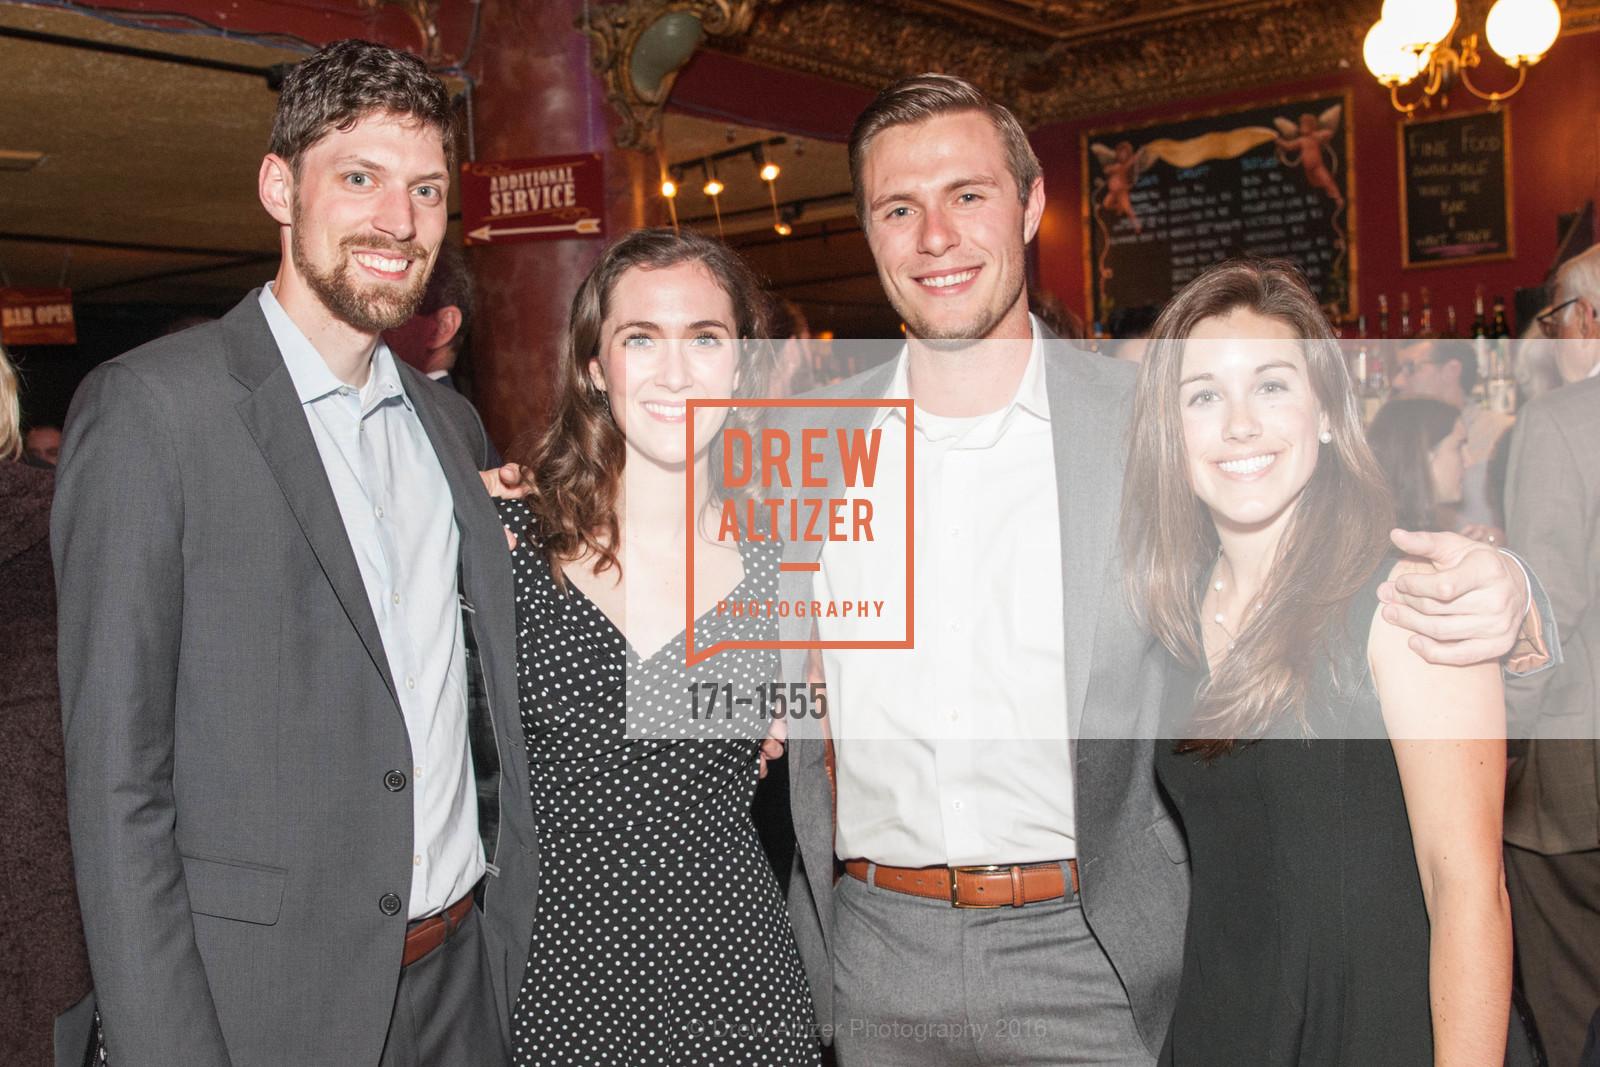 Sean Leake, Emily English, Tyler Parker, Jayne Callander, Photo #171-1555